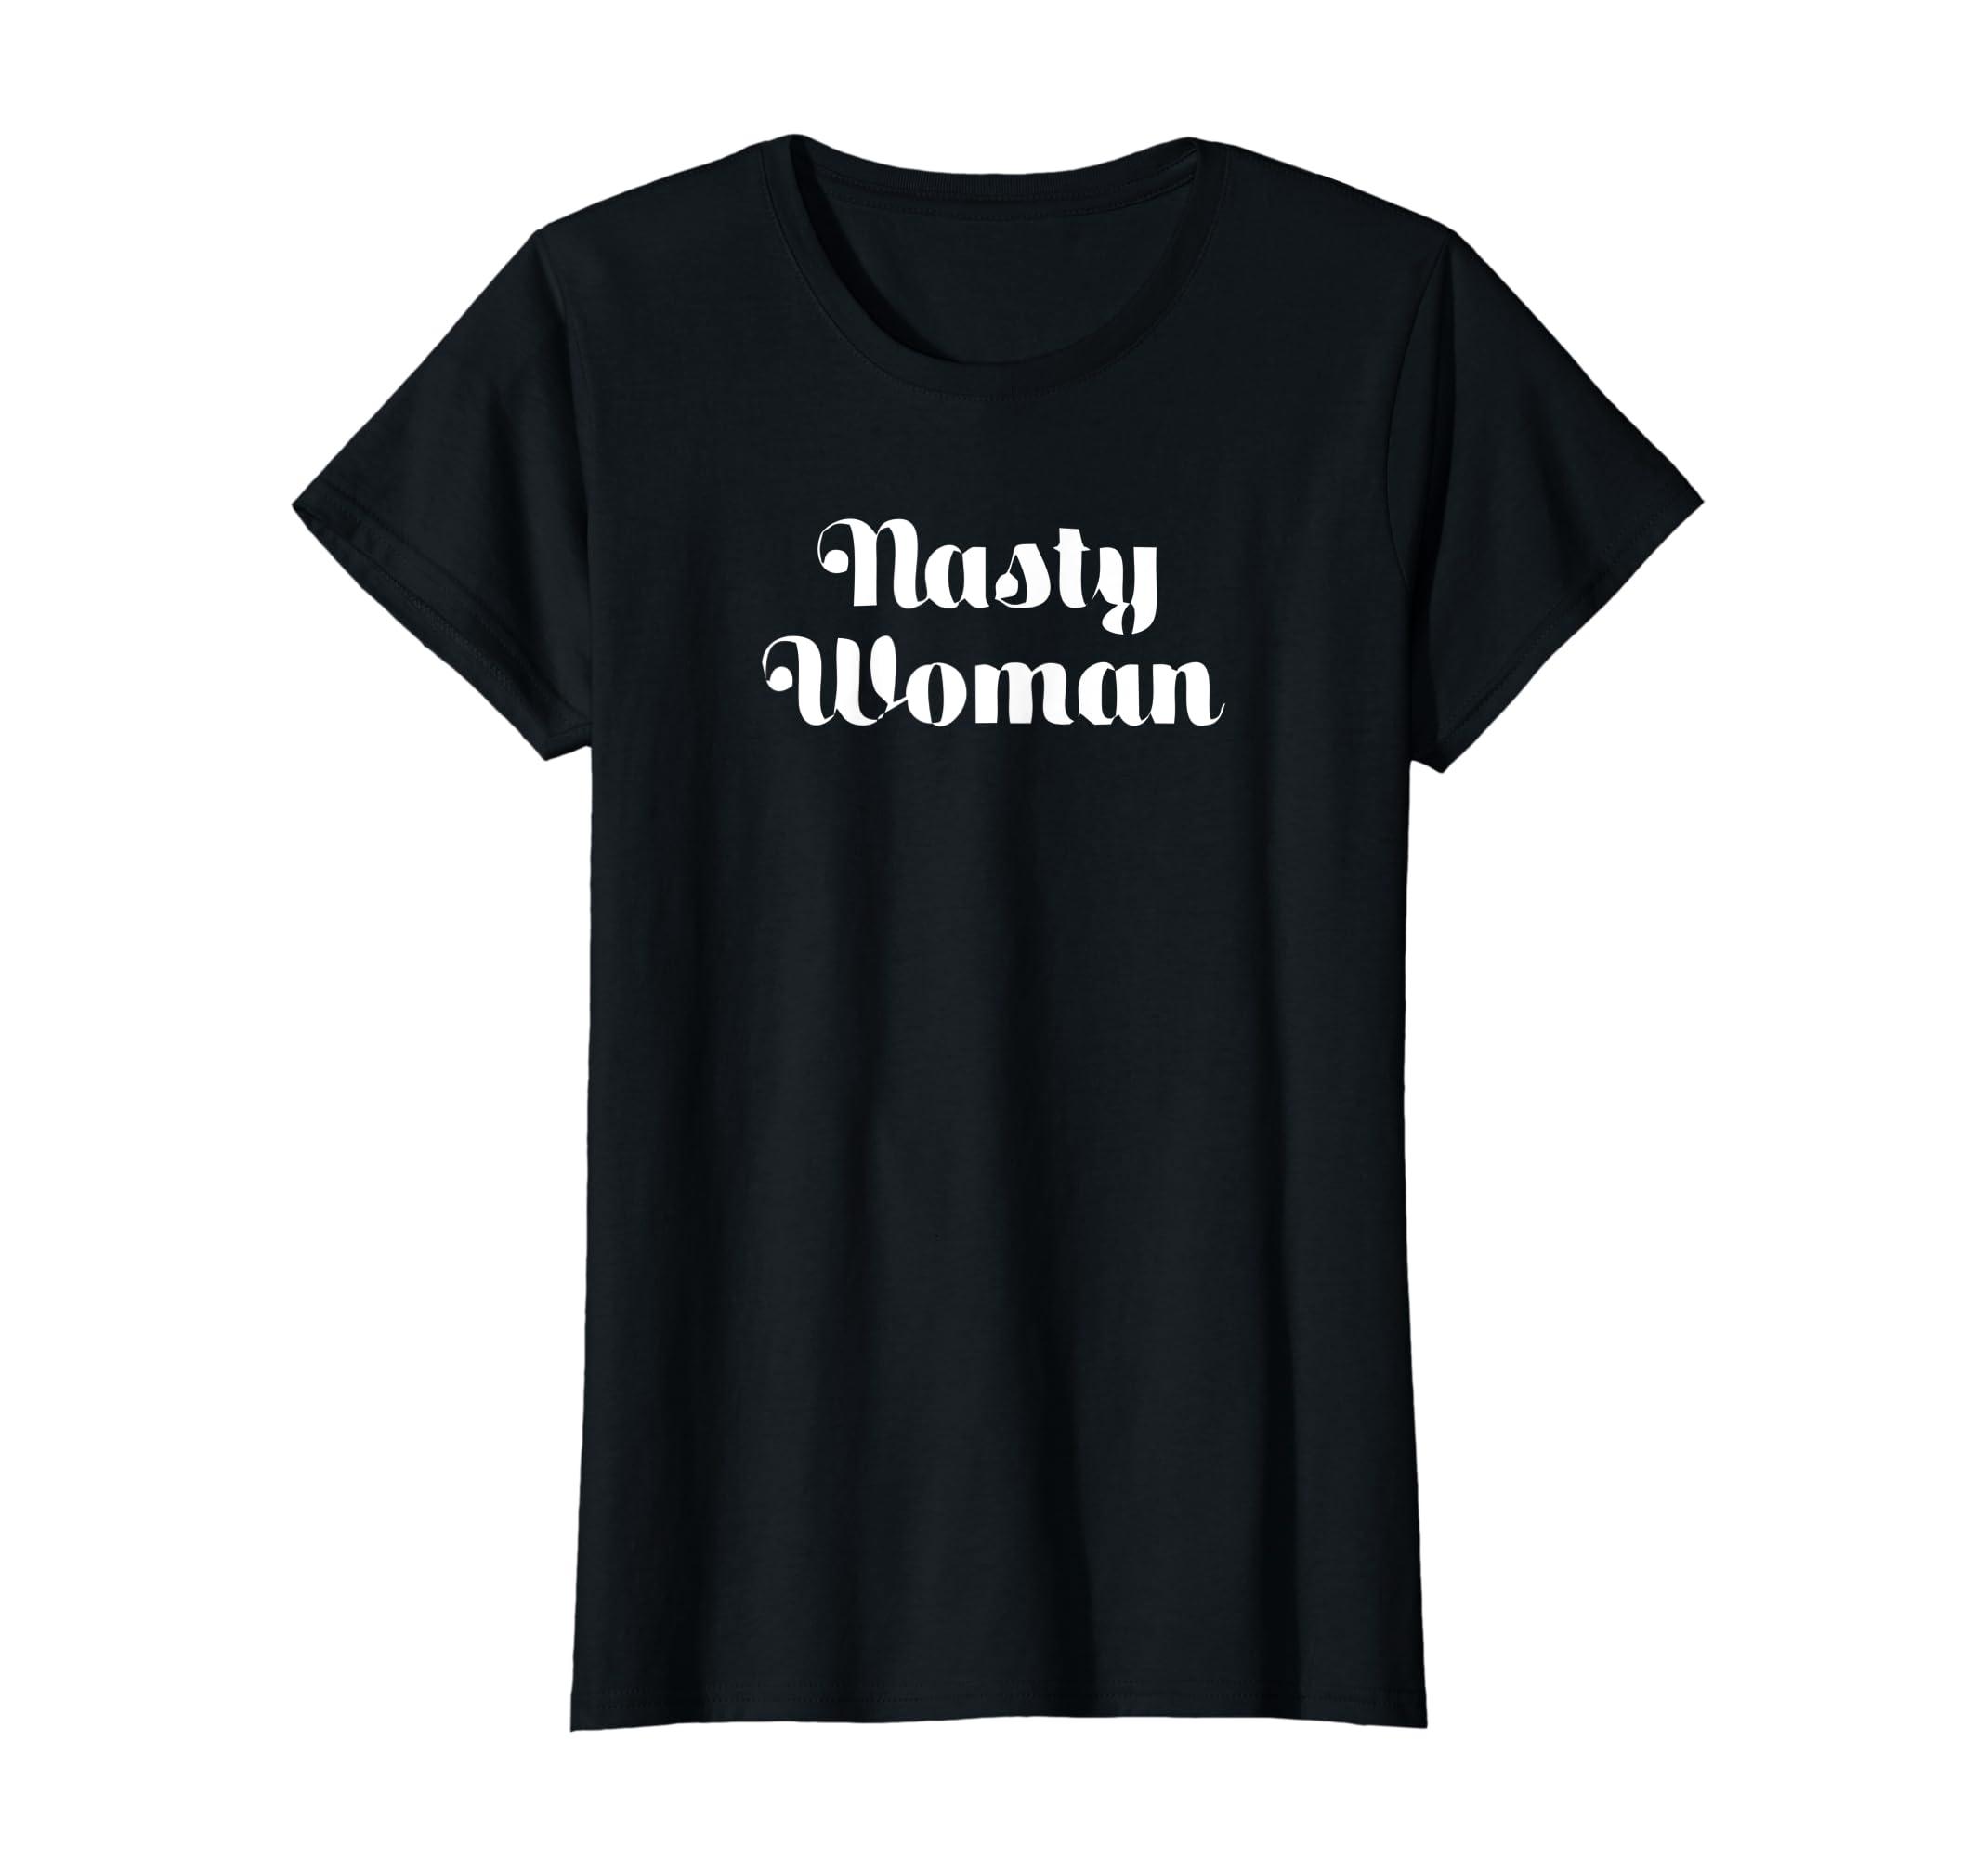 1a21f956 Amazon.com: Womens Nasty Woman T-Shirt | Nasty Woman Shirt: Clothing